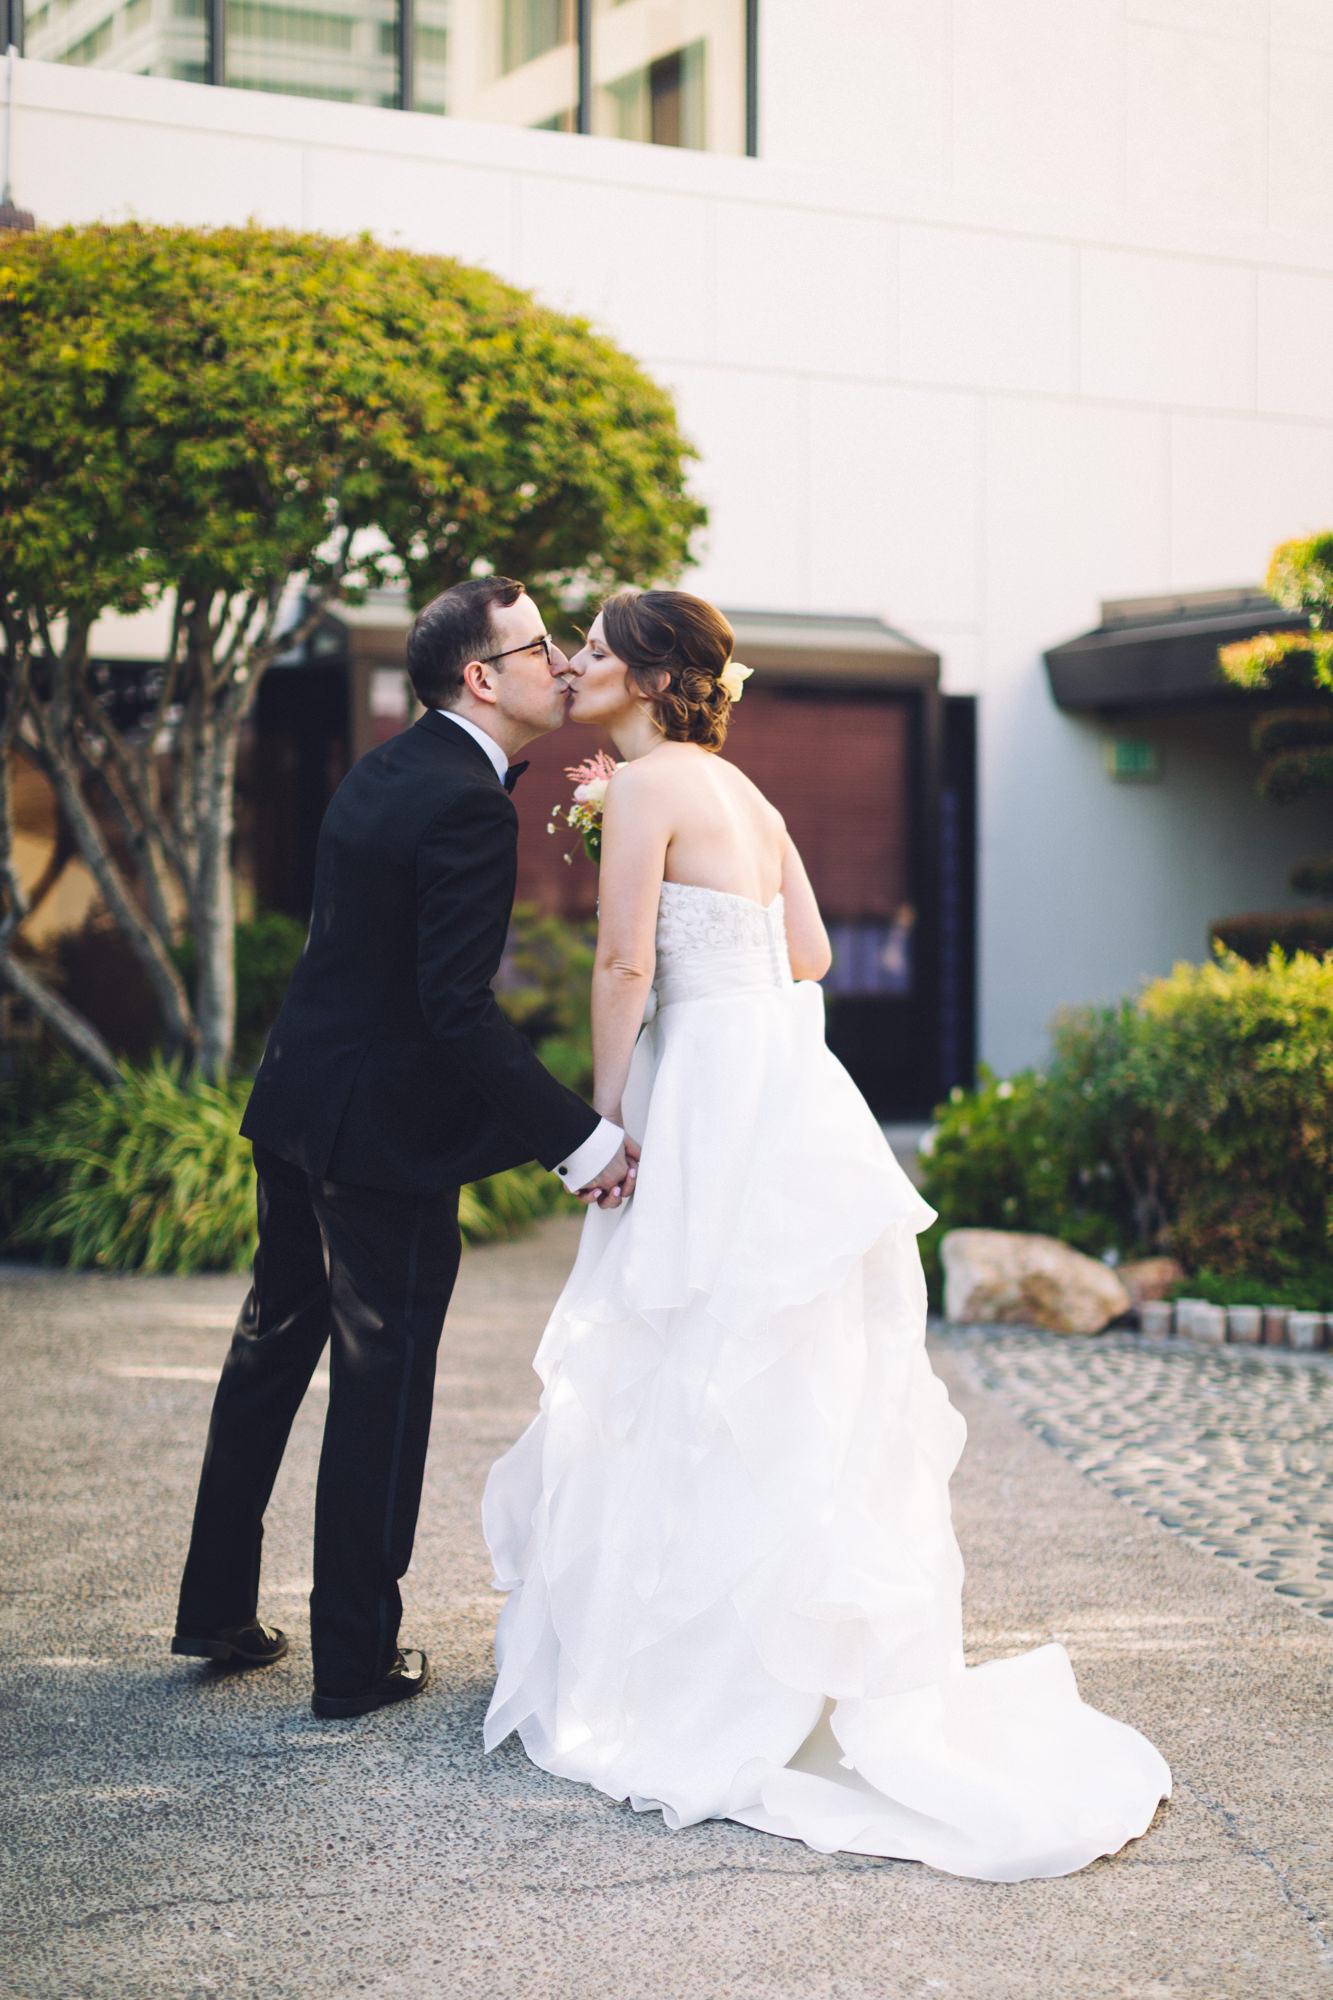 thelightandglass-wedding-engagement-photography-068.jpg